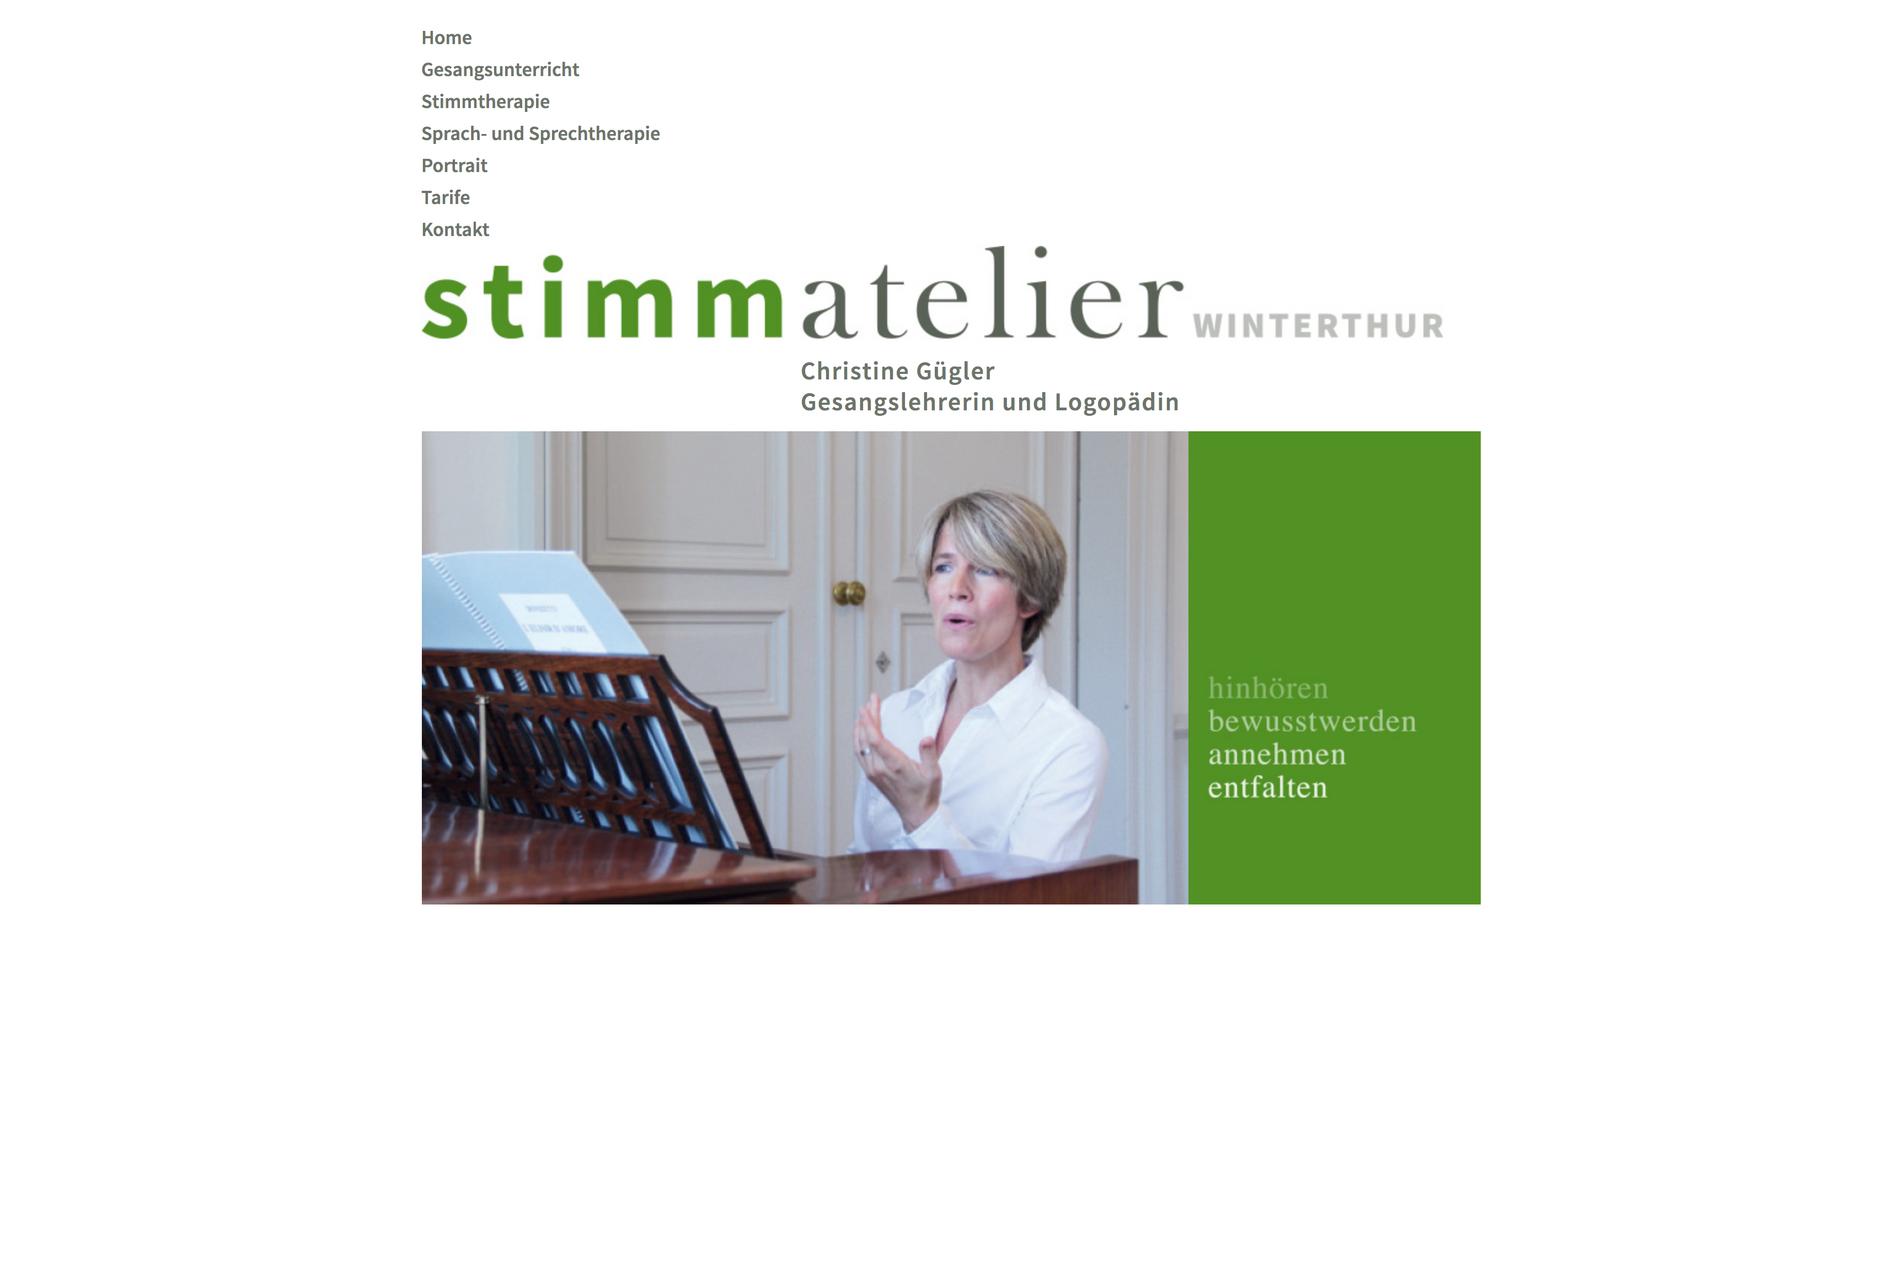 www.stimmatelier.ch